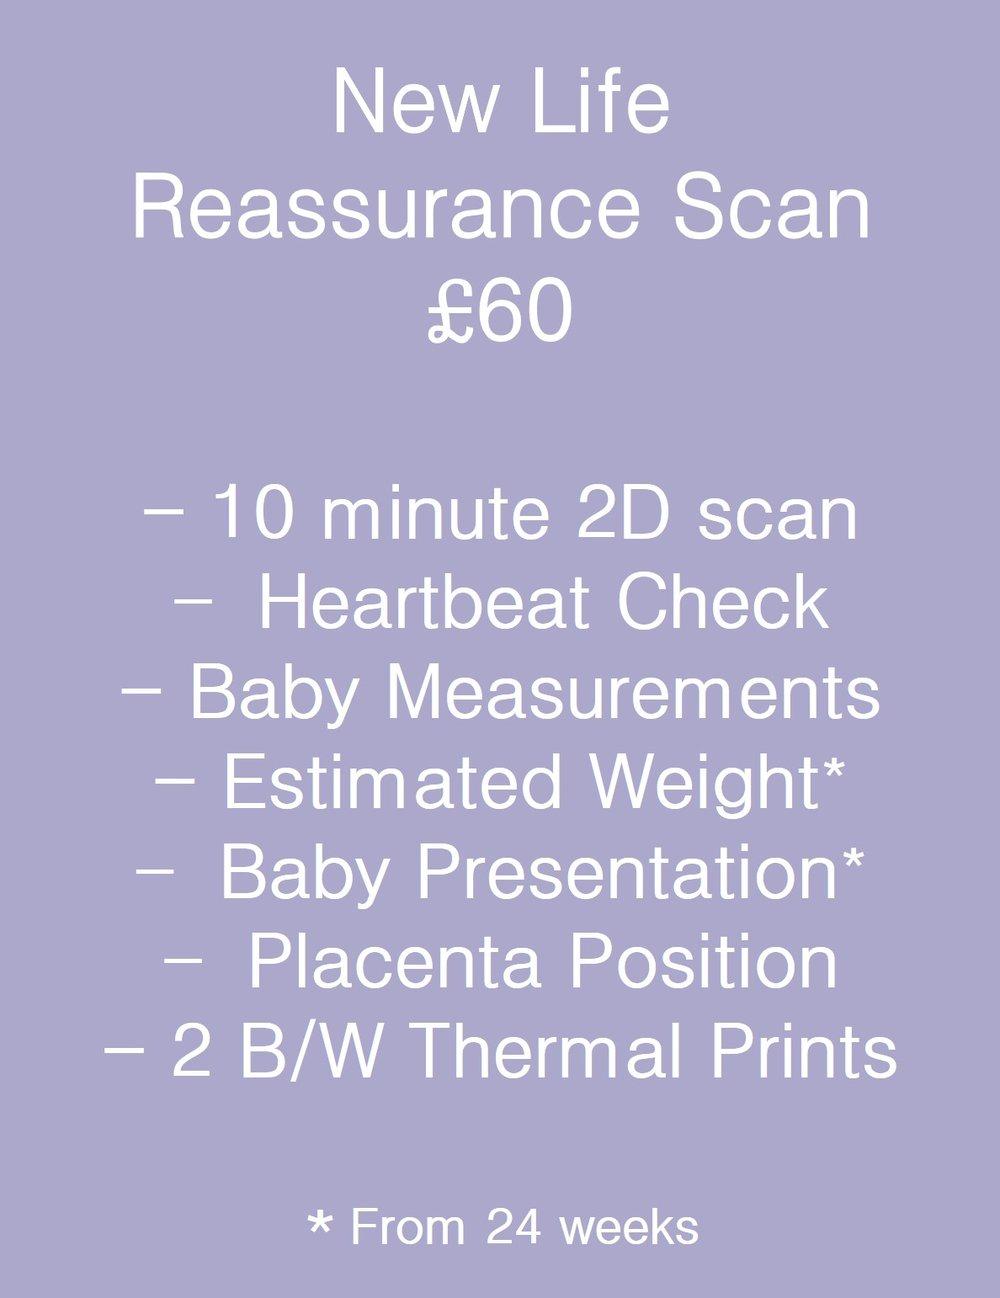 New life reassurance scan sheffield.jpg